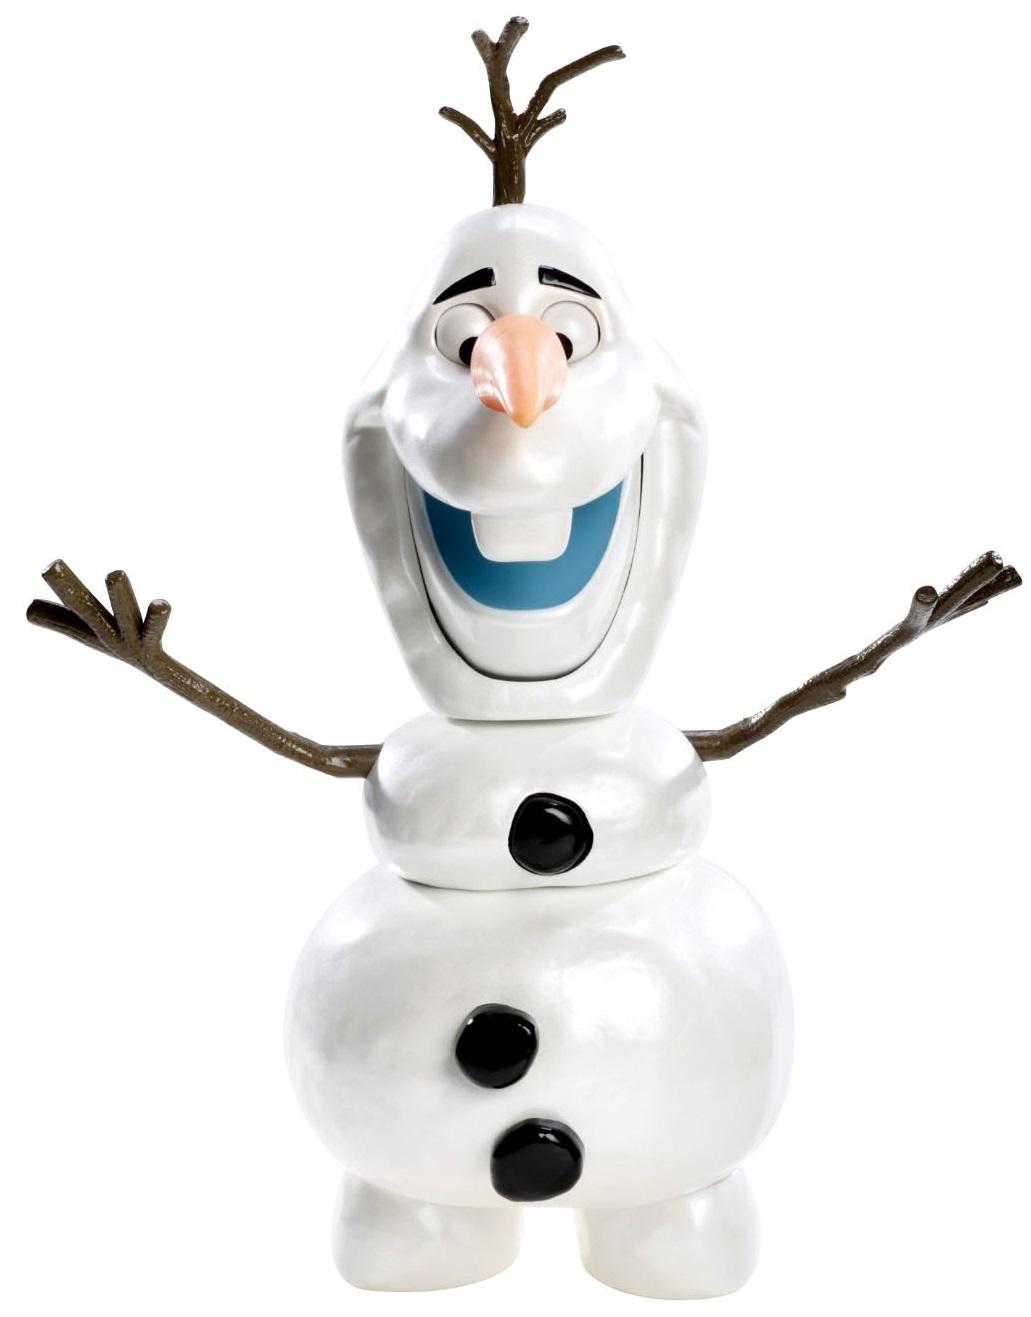 Игрушка Снеговик Олаф Холодное сердцеКуклы холодное сердце<br>Игрушка Снеговик Олаф Холодное сердце<br>